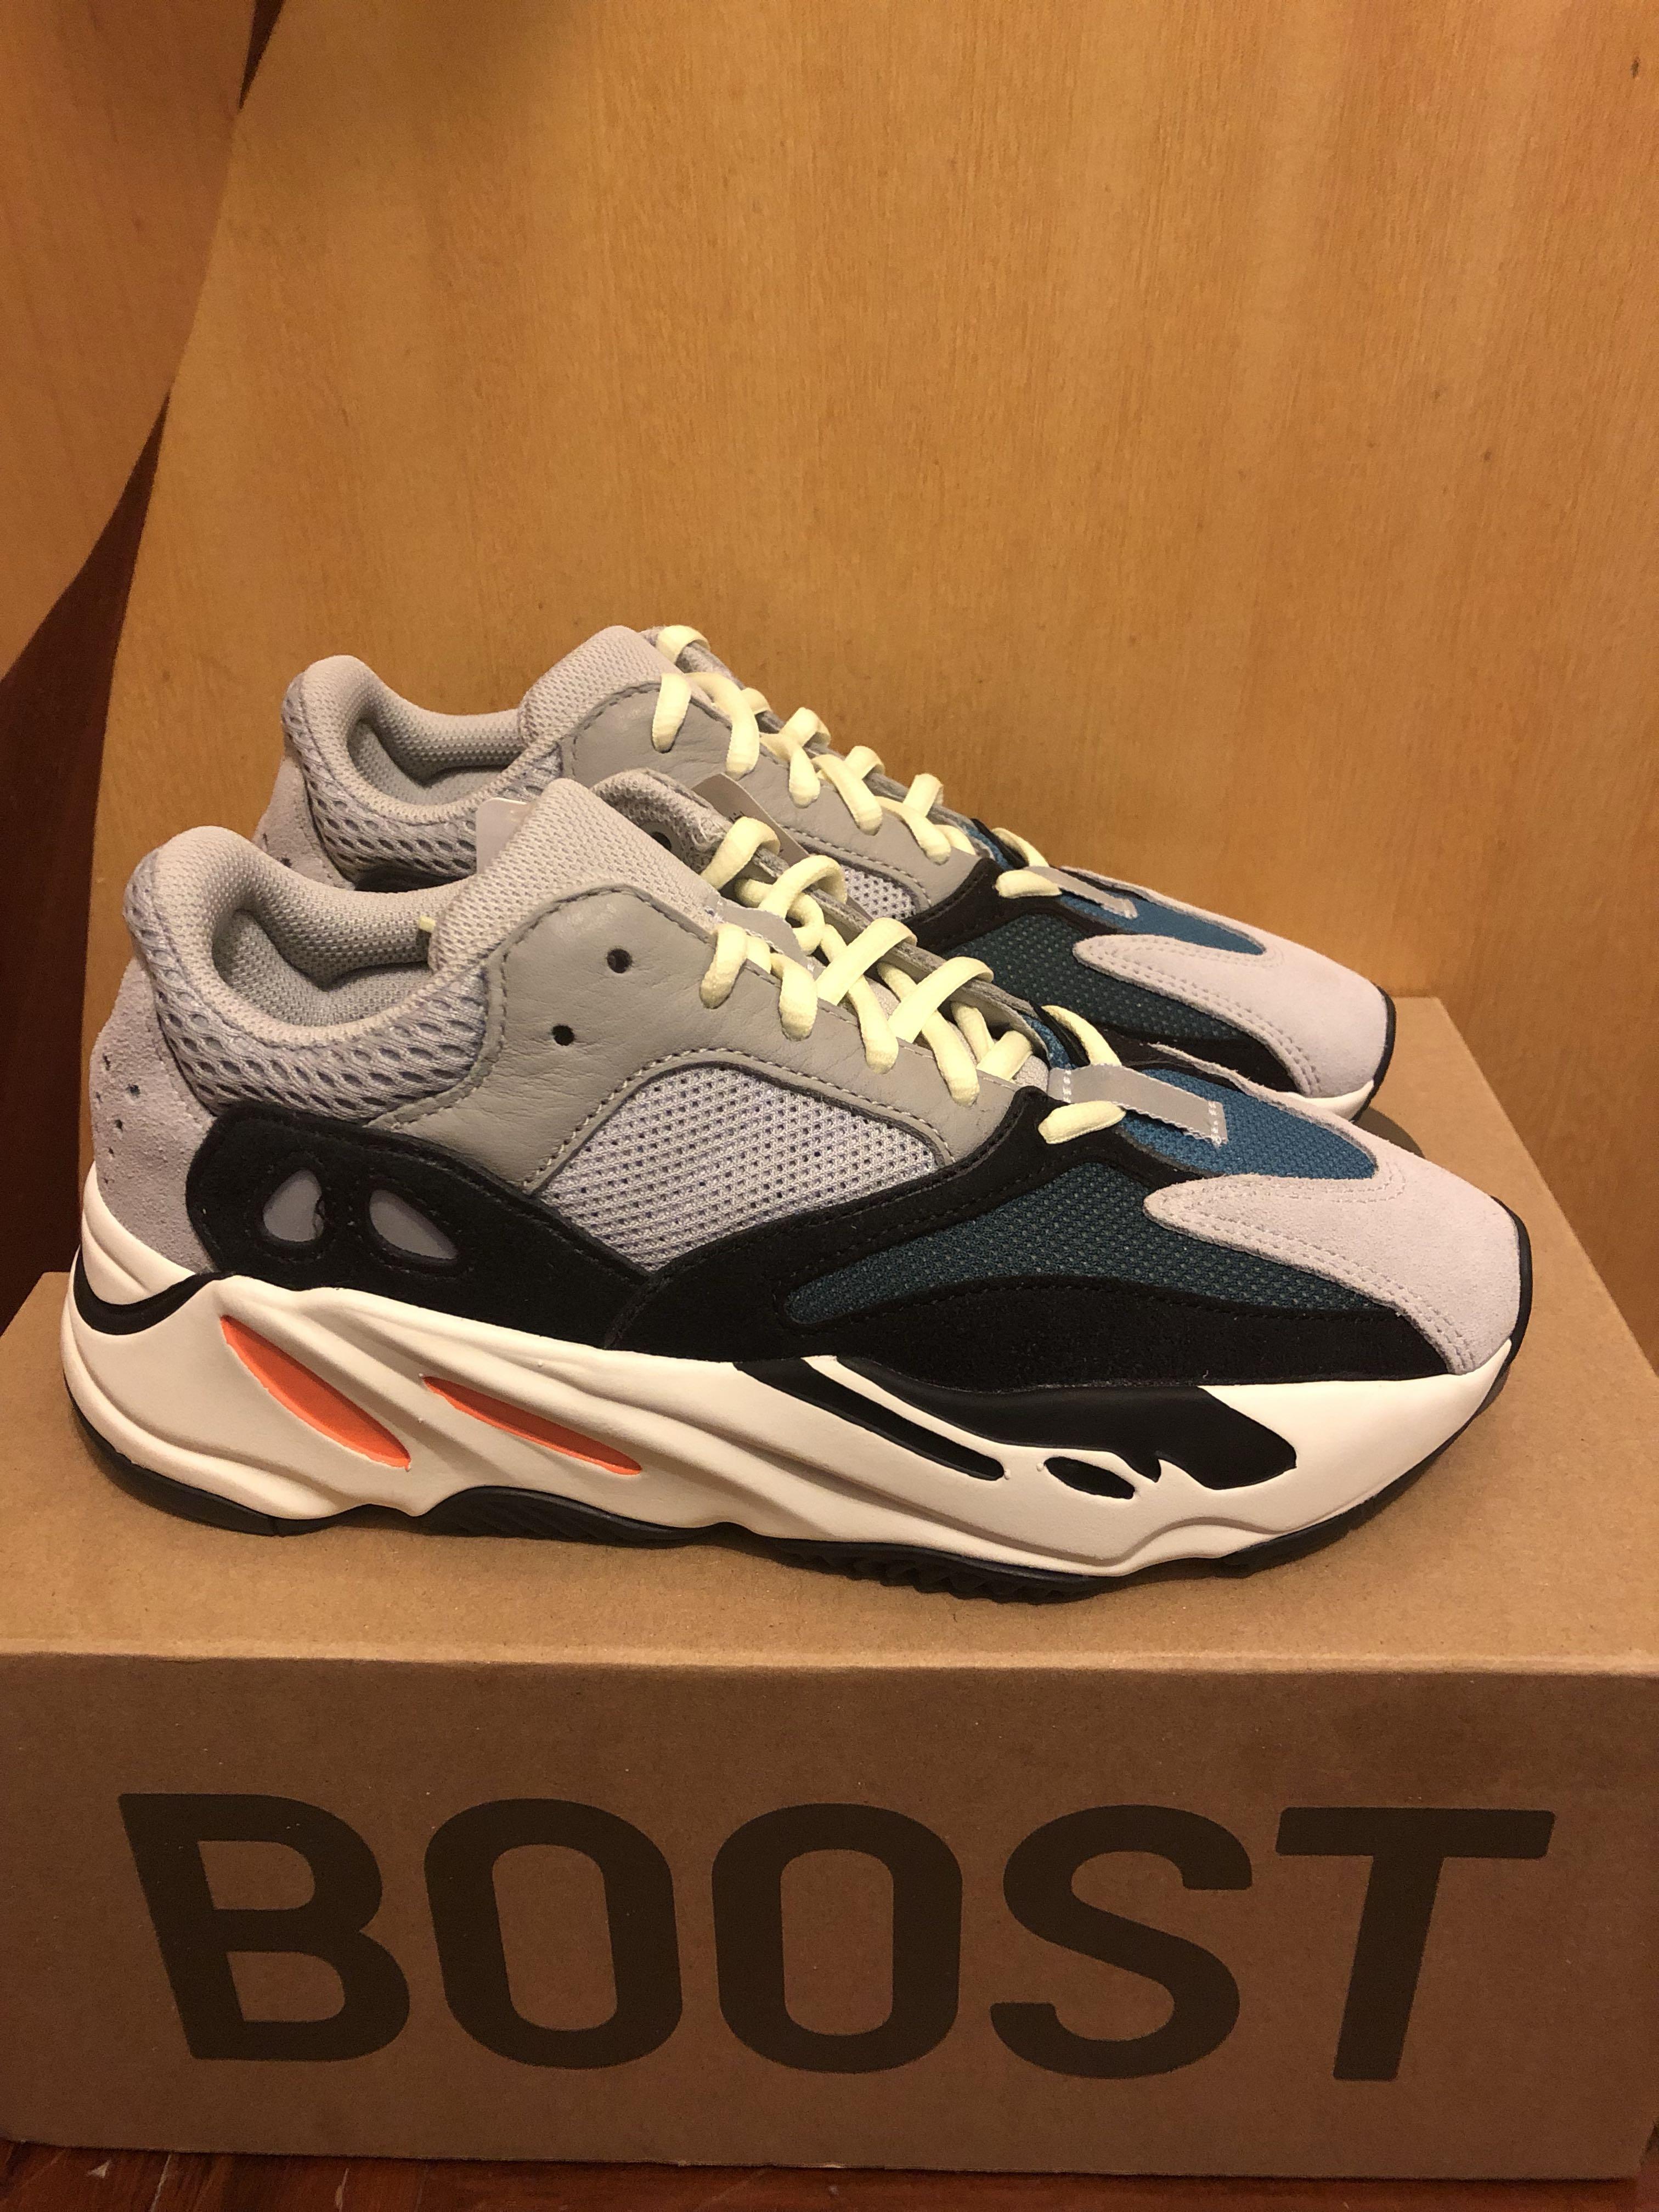 Uk 5 adidas Yeezy 700 OG